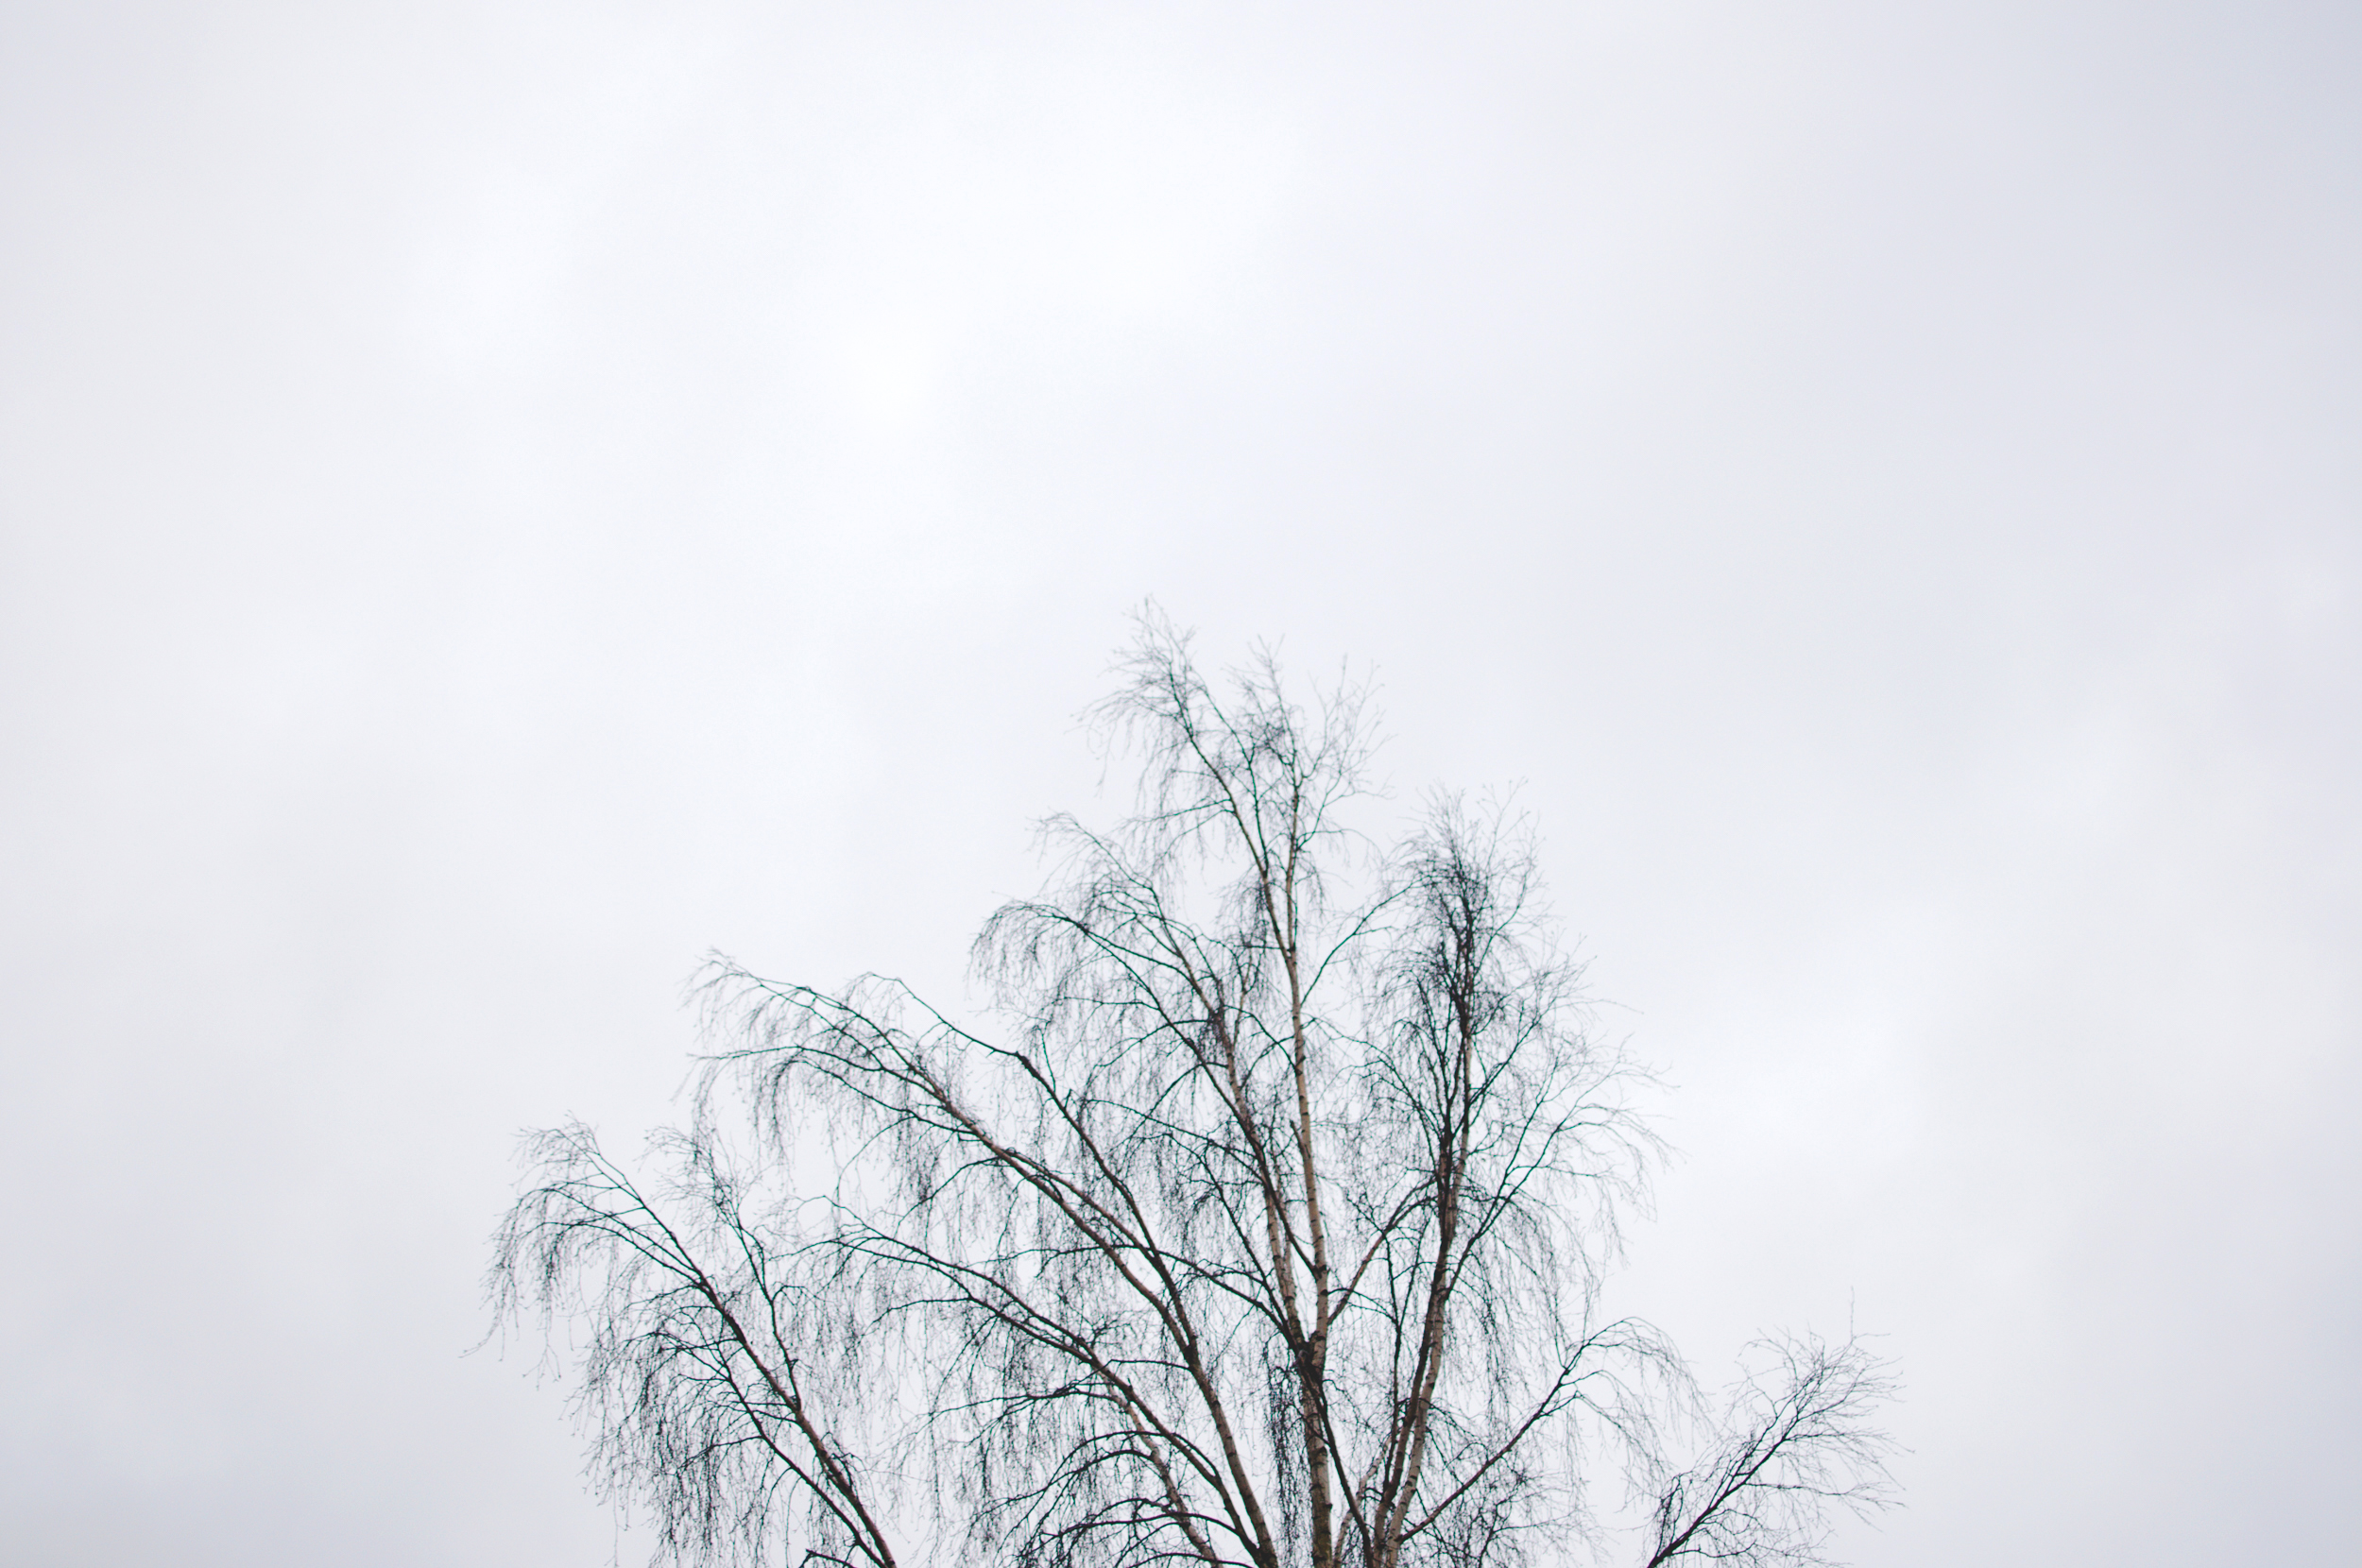 gothenburg-marta-vargas-4.jpg